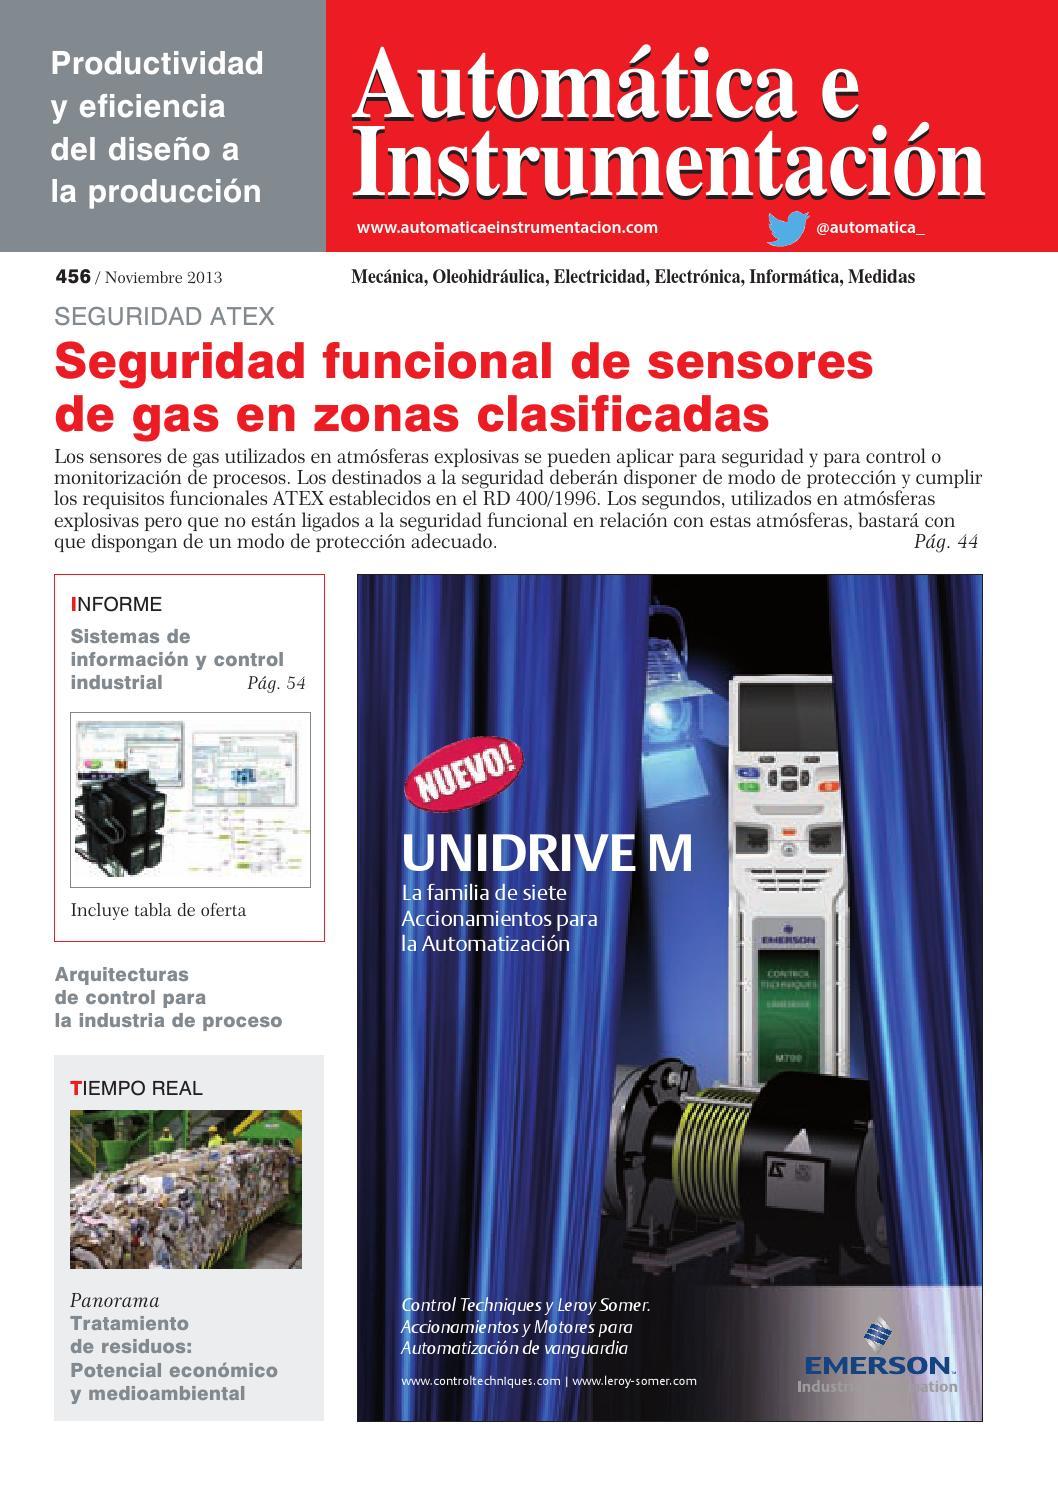 Automática e Instrumentación - nº 456 by Digital Newspapers S.L. - issuu